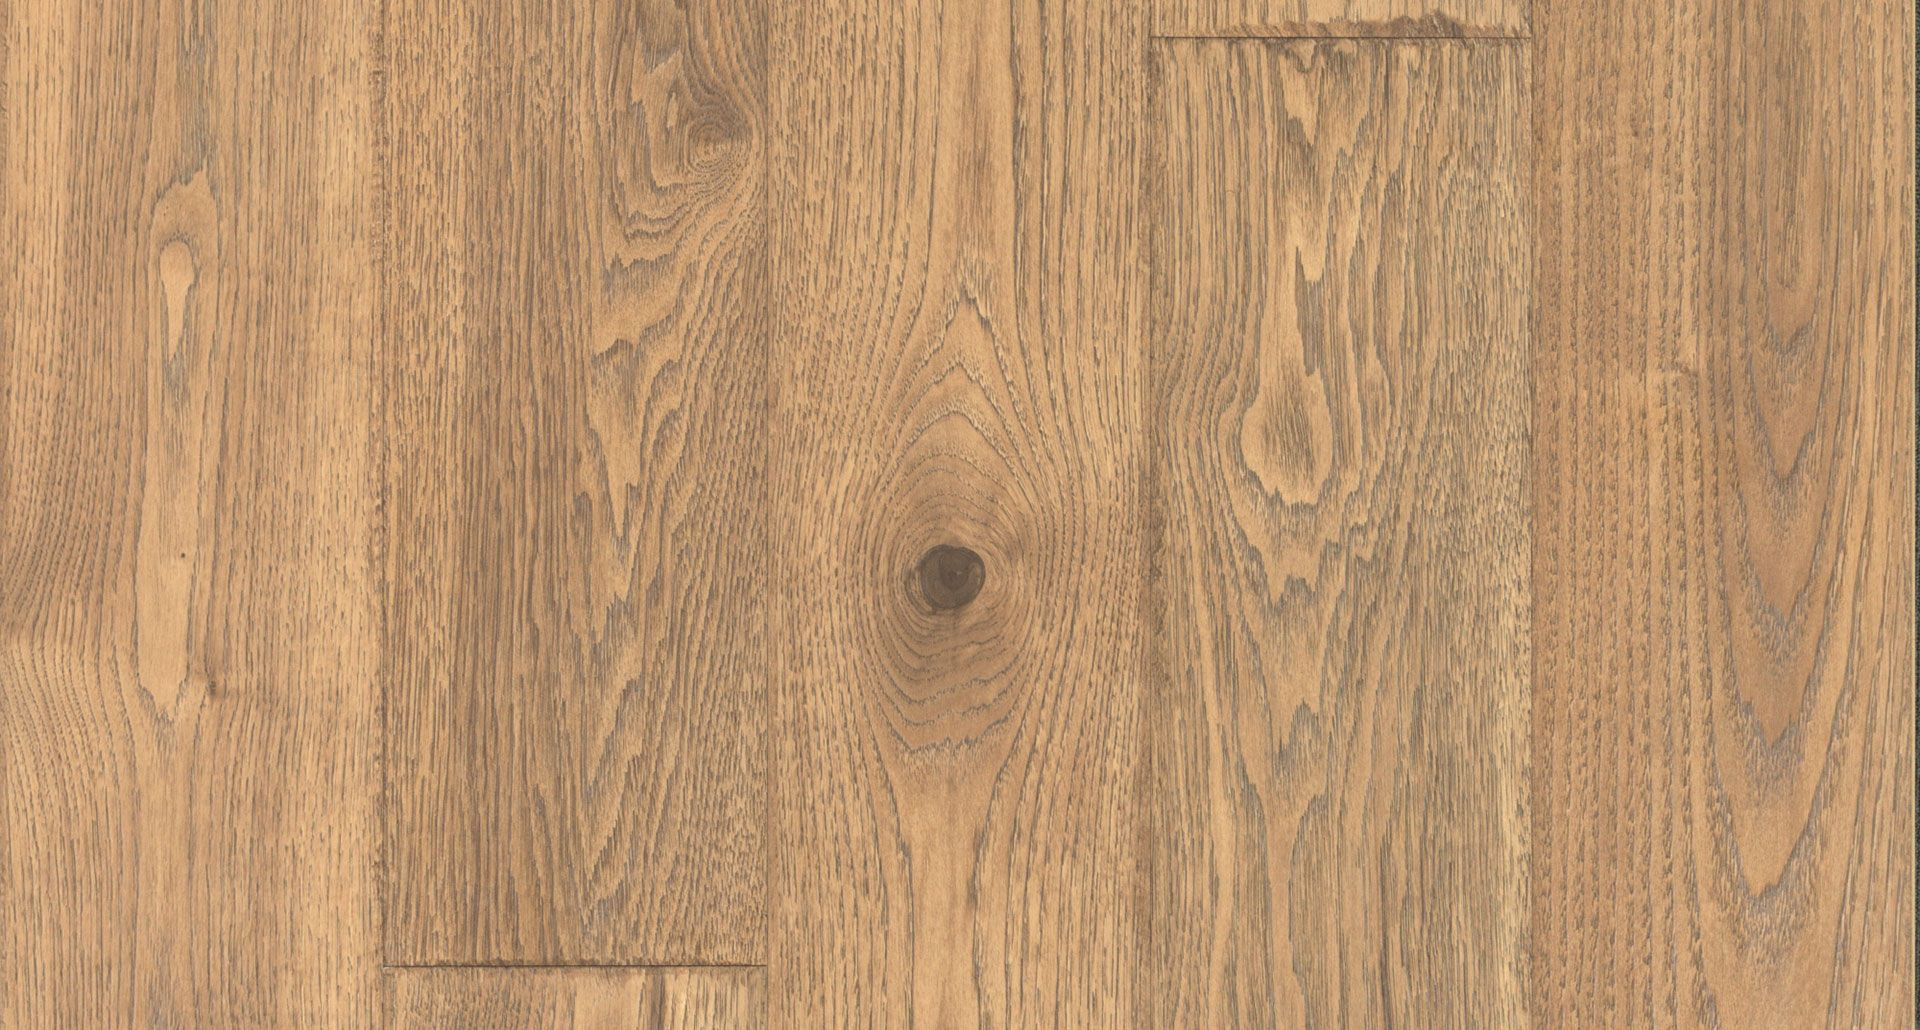 hardwood floor nails lowes of brier creek oak pergoa timbercraft wetprotect laminate flooring 2 99 intended for brier creek oak pergoa timbercraft wetprotect laminate flooring 2 99 sqft at lowes